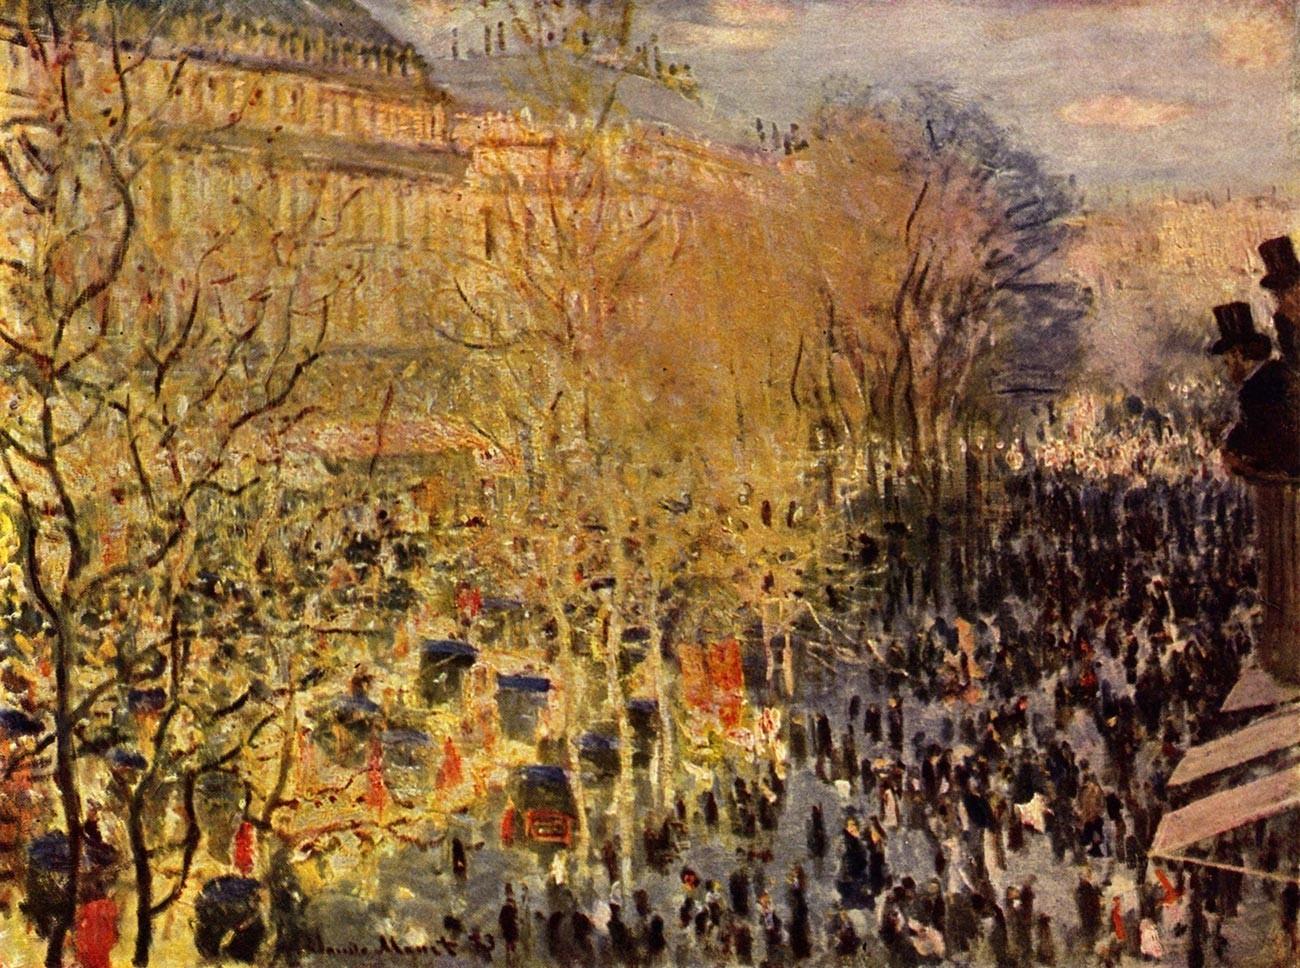 Claude Monet. Boulevard des Capucines, 1873.